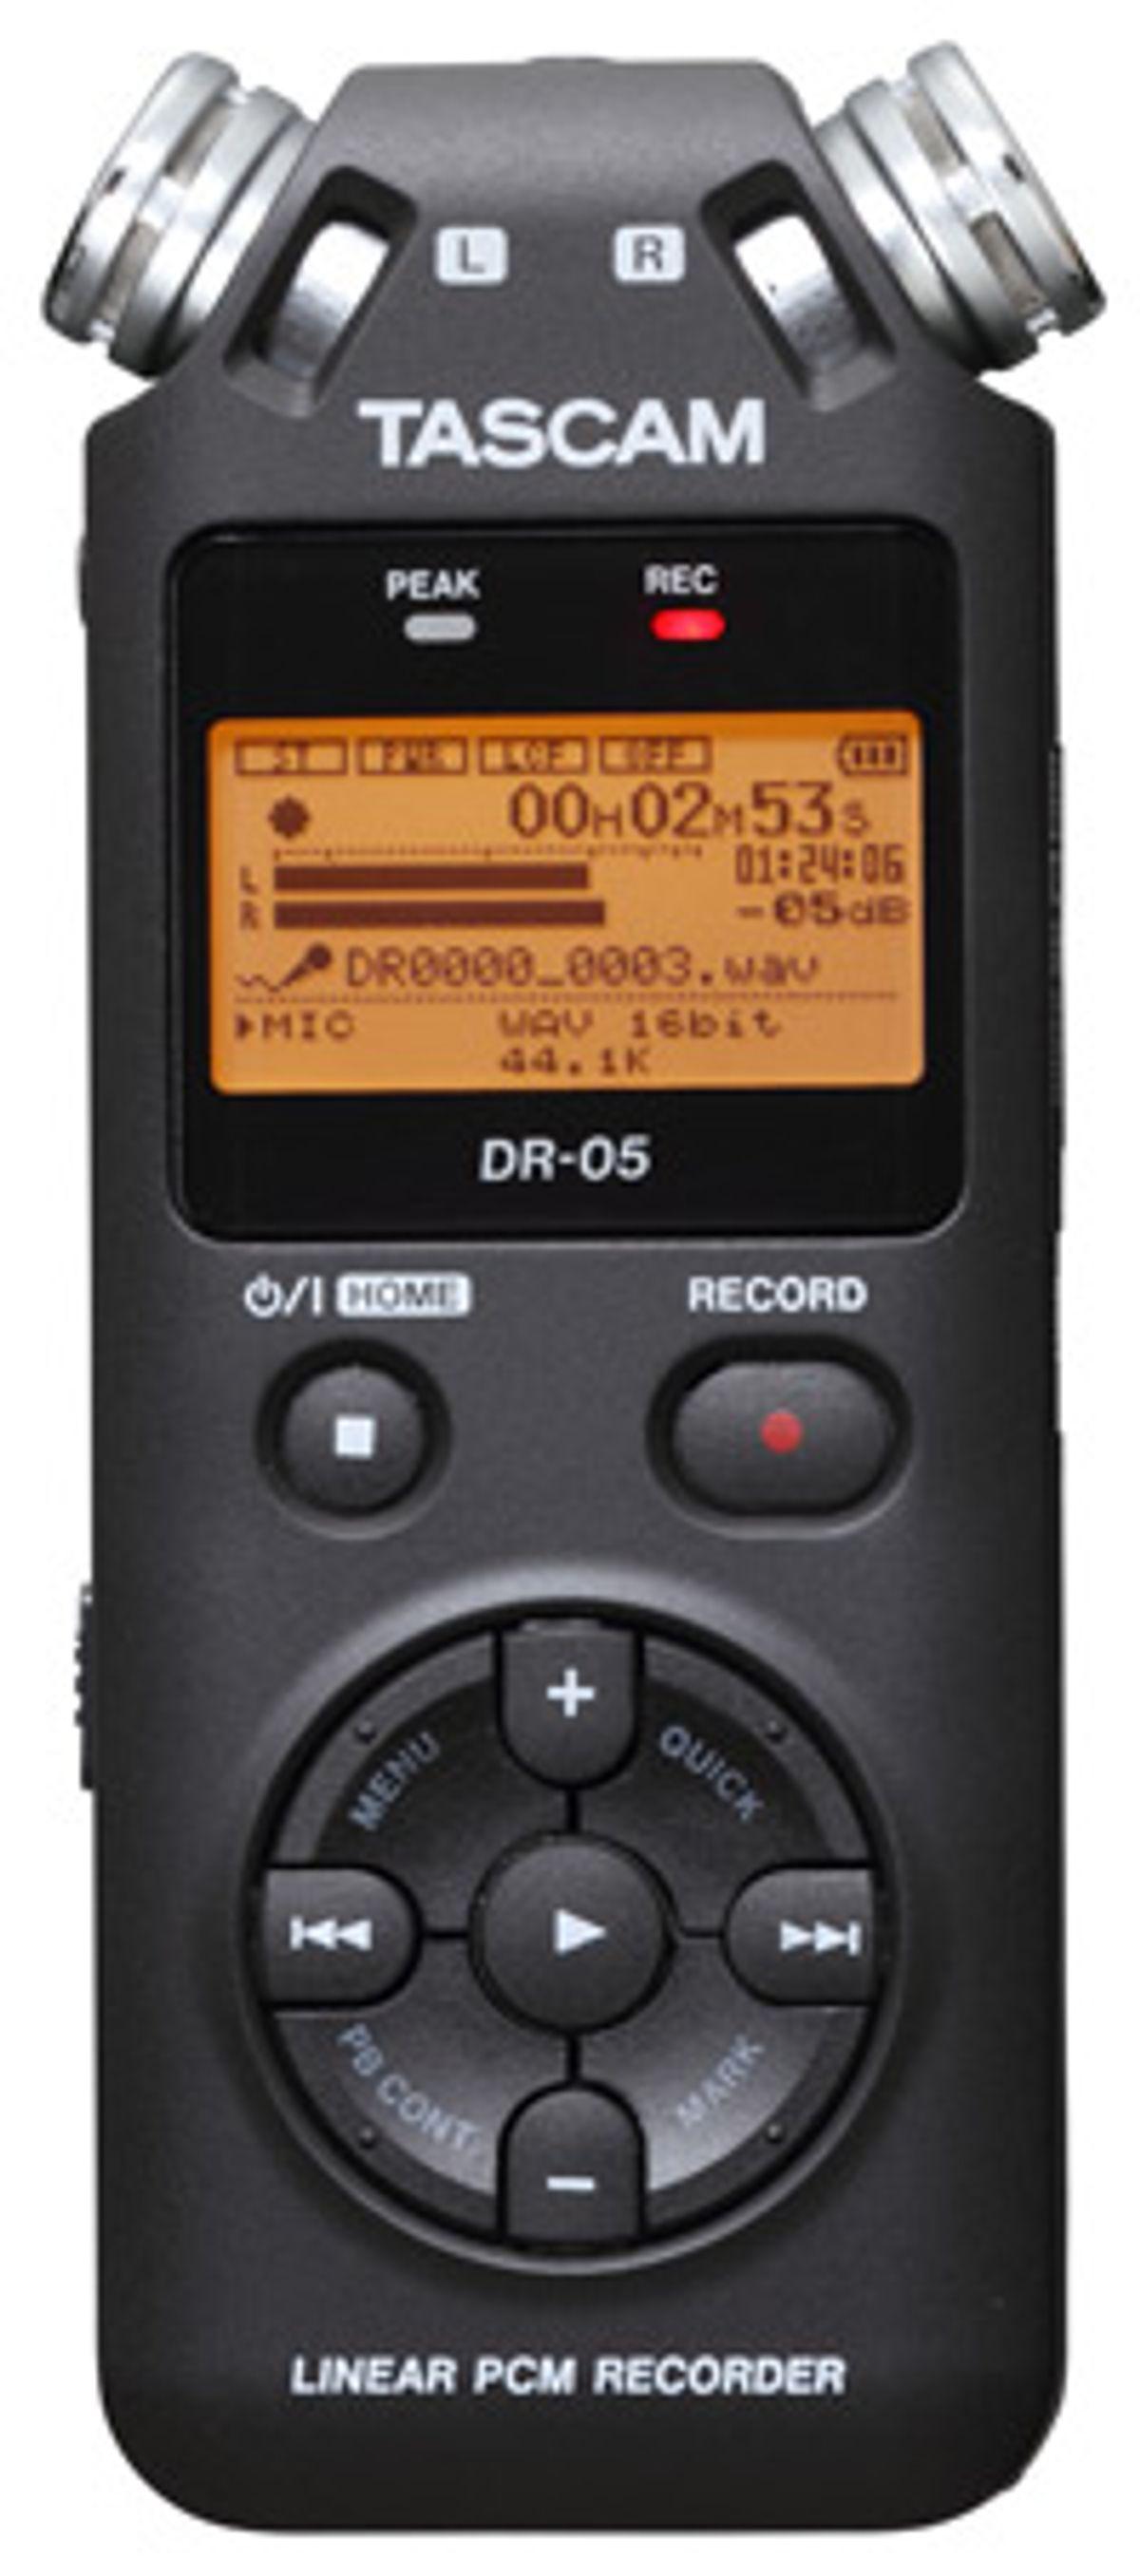 TASCAM Releases DR-05 Recorder